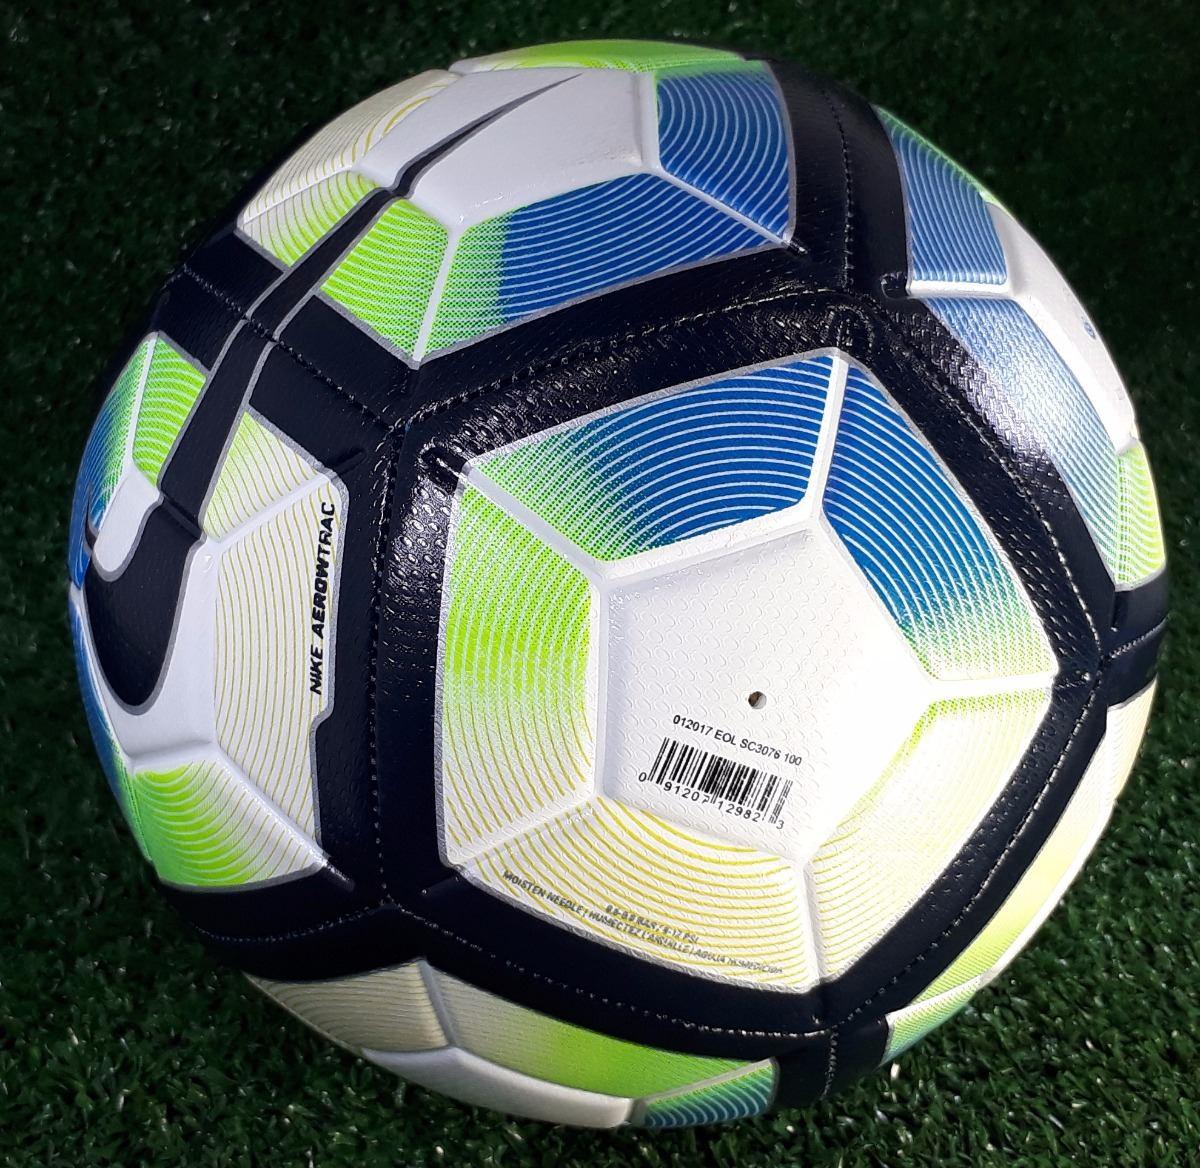 3a76eef309f12 Bo A Nike Strike Cbf 20d0d07f88a030 Mtvnewsbd Com. Bola Nike Strike Brasil Campo  Nike